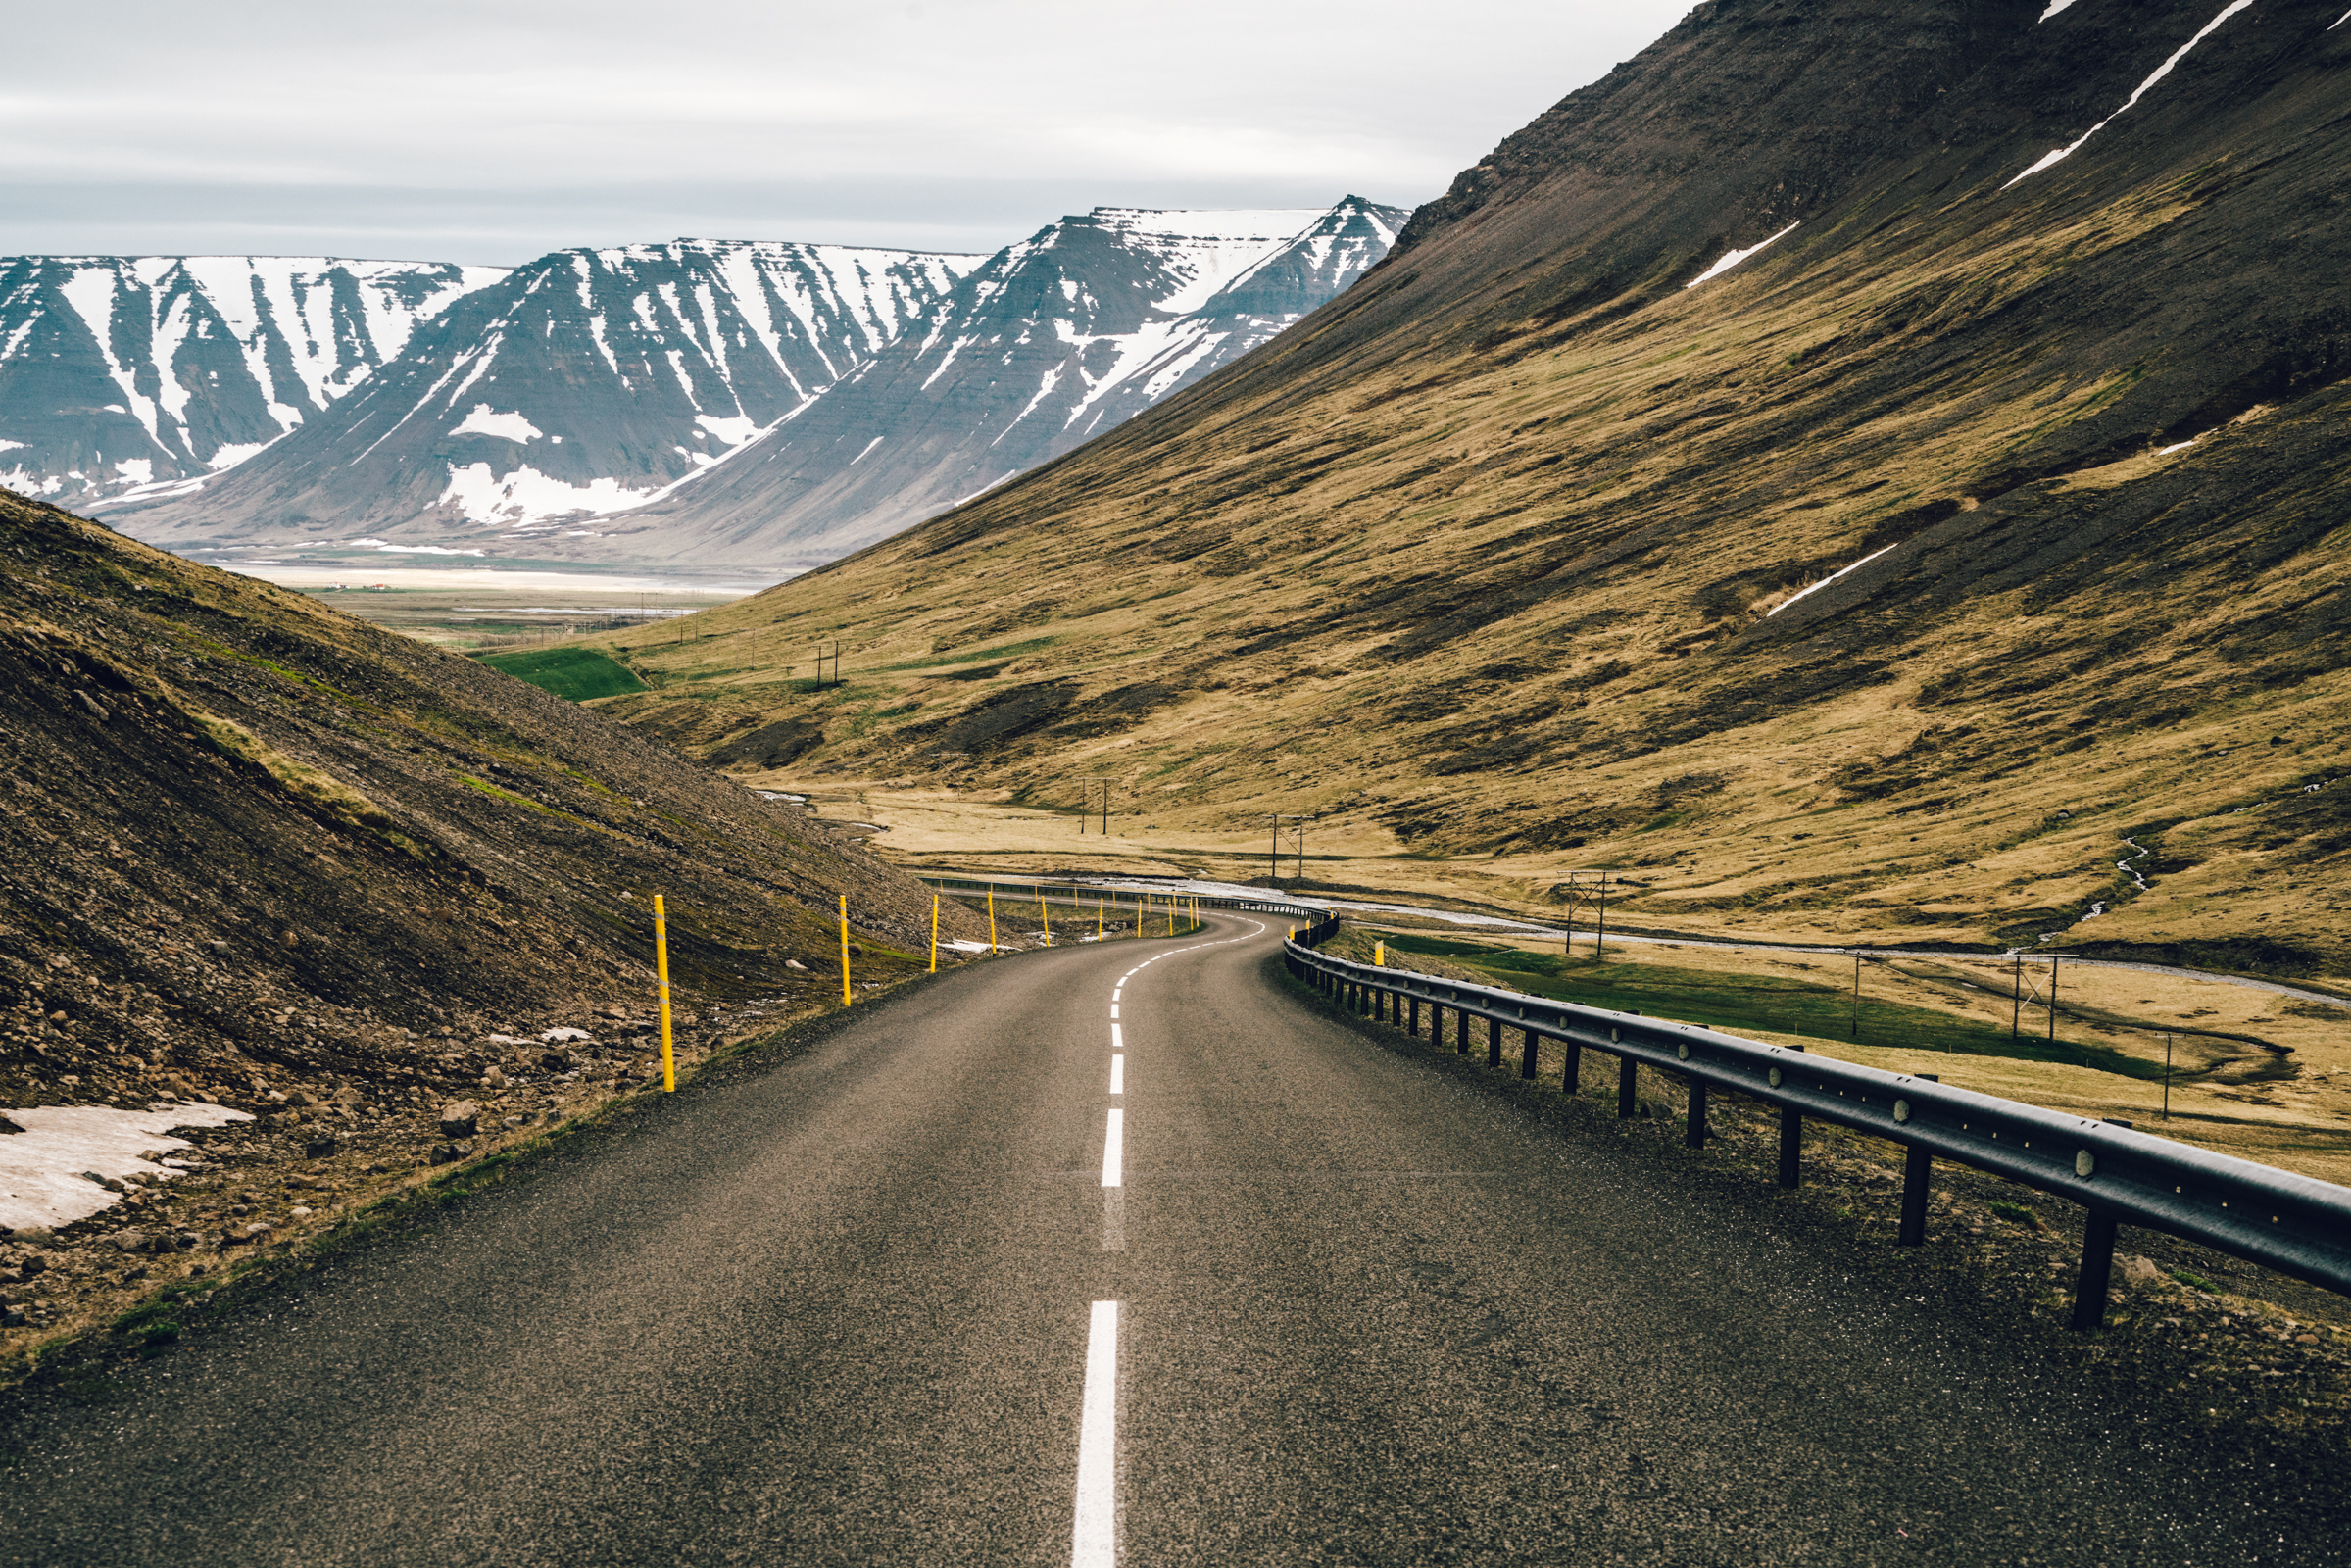 visitwestfjords-1.jpg